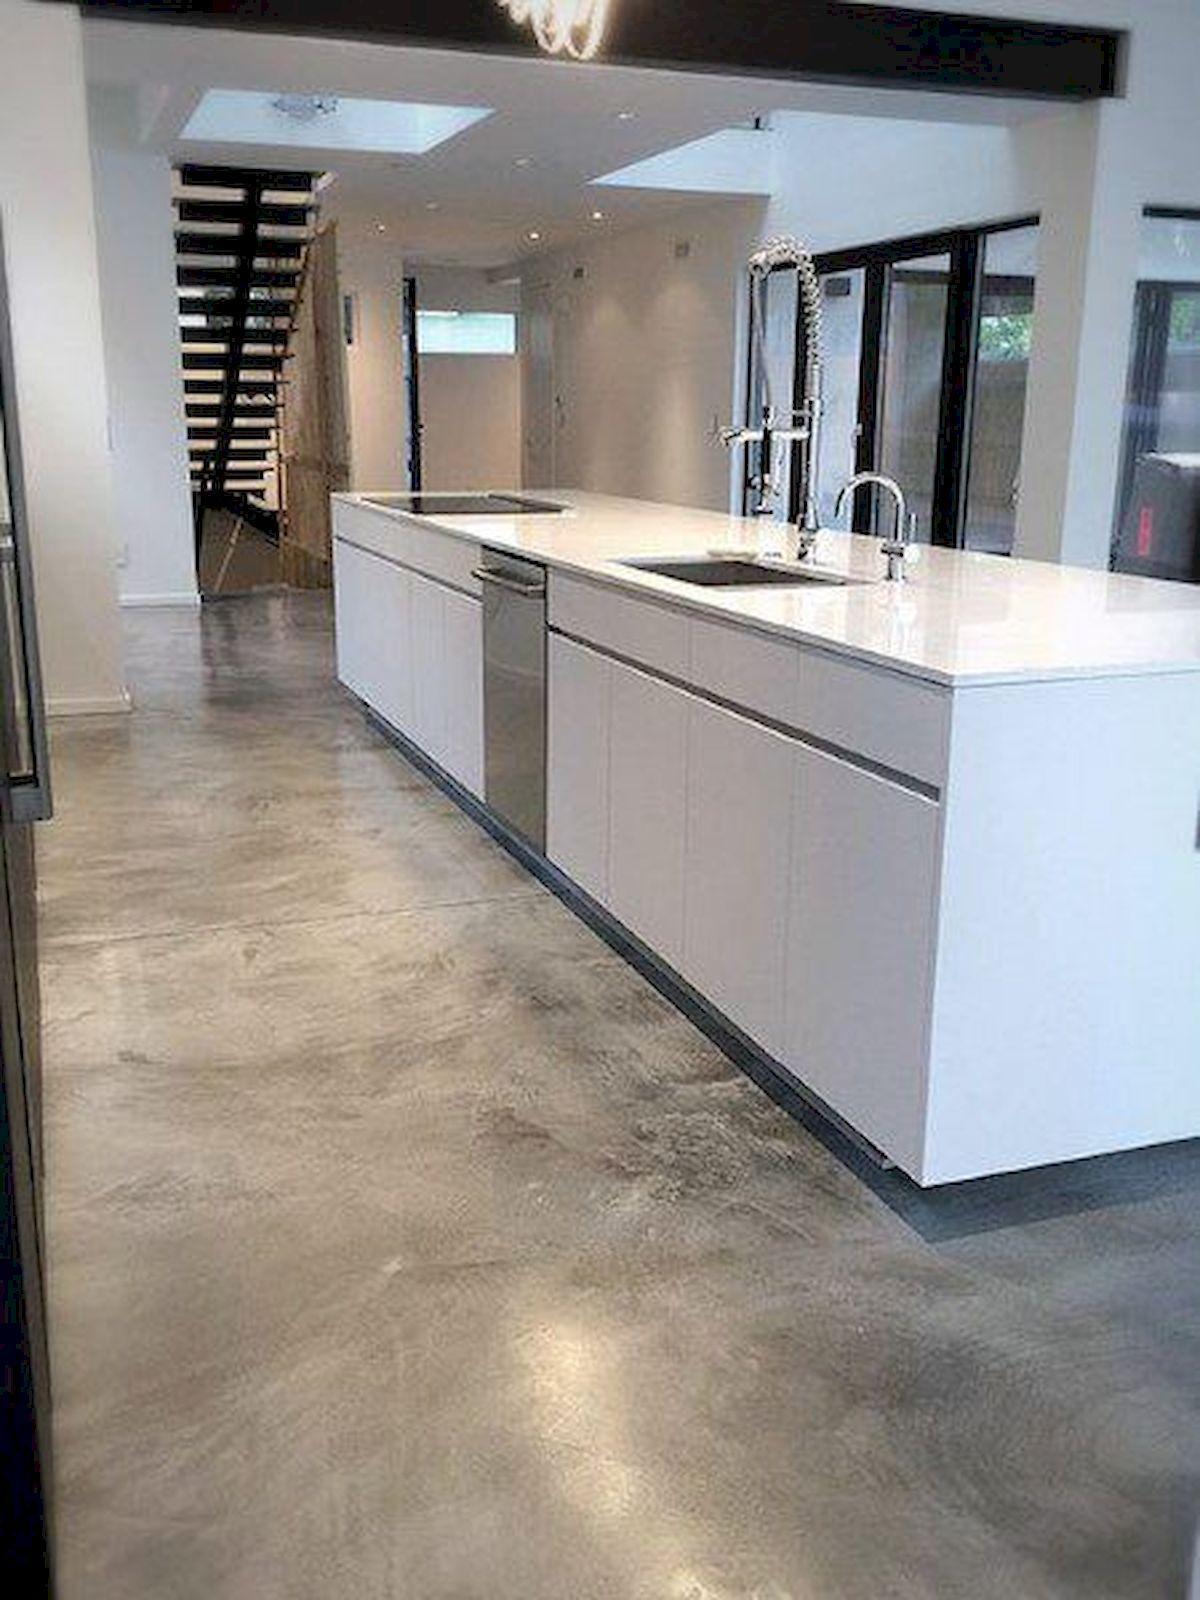 70 smooth concrete floor ideas for interior home 22